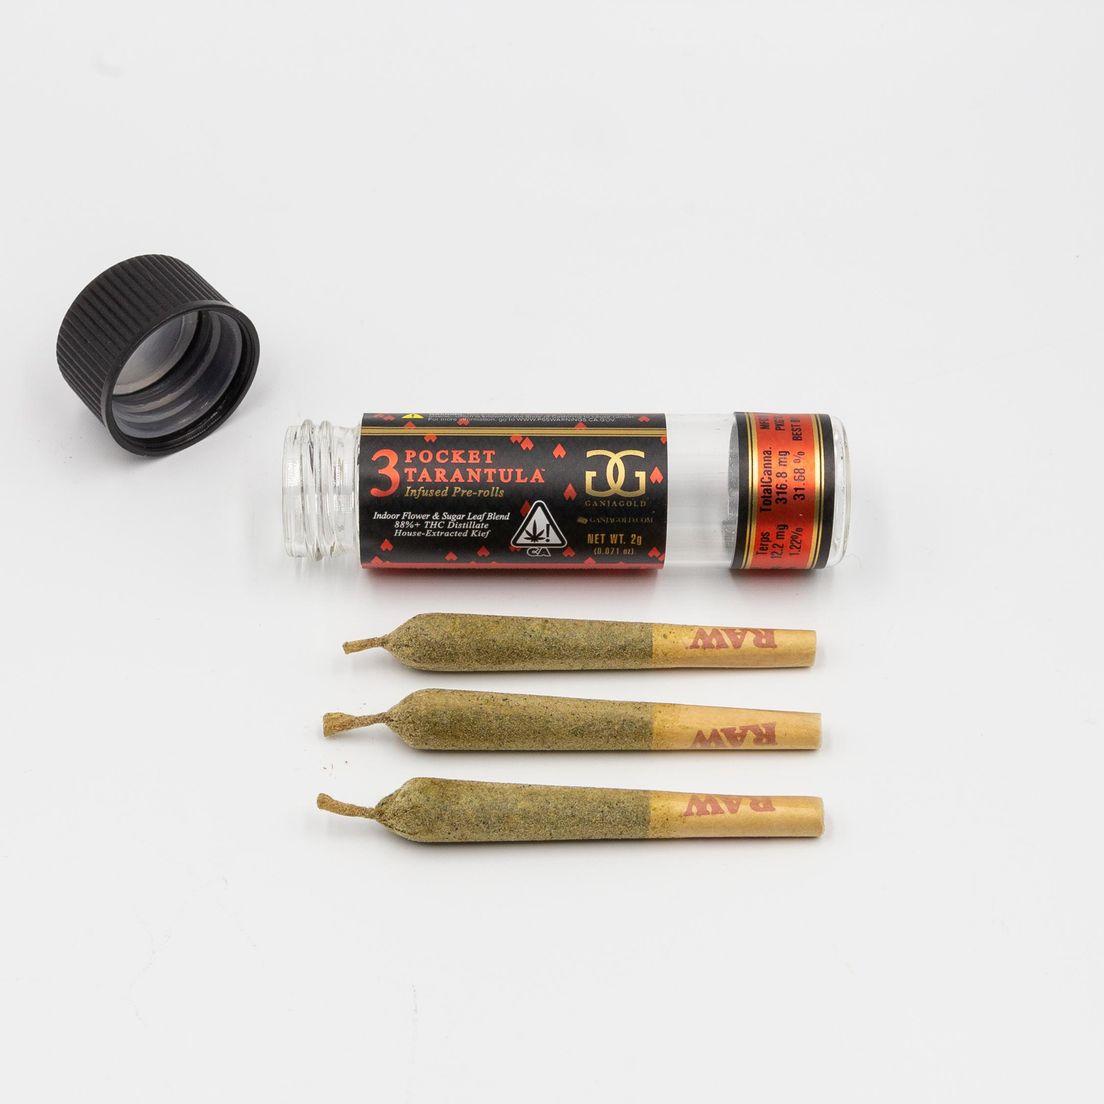 GANJA GOLD - Red Pocket Tarantula 2g - Indica